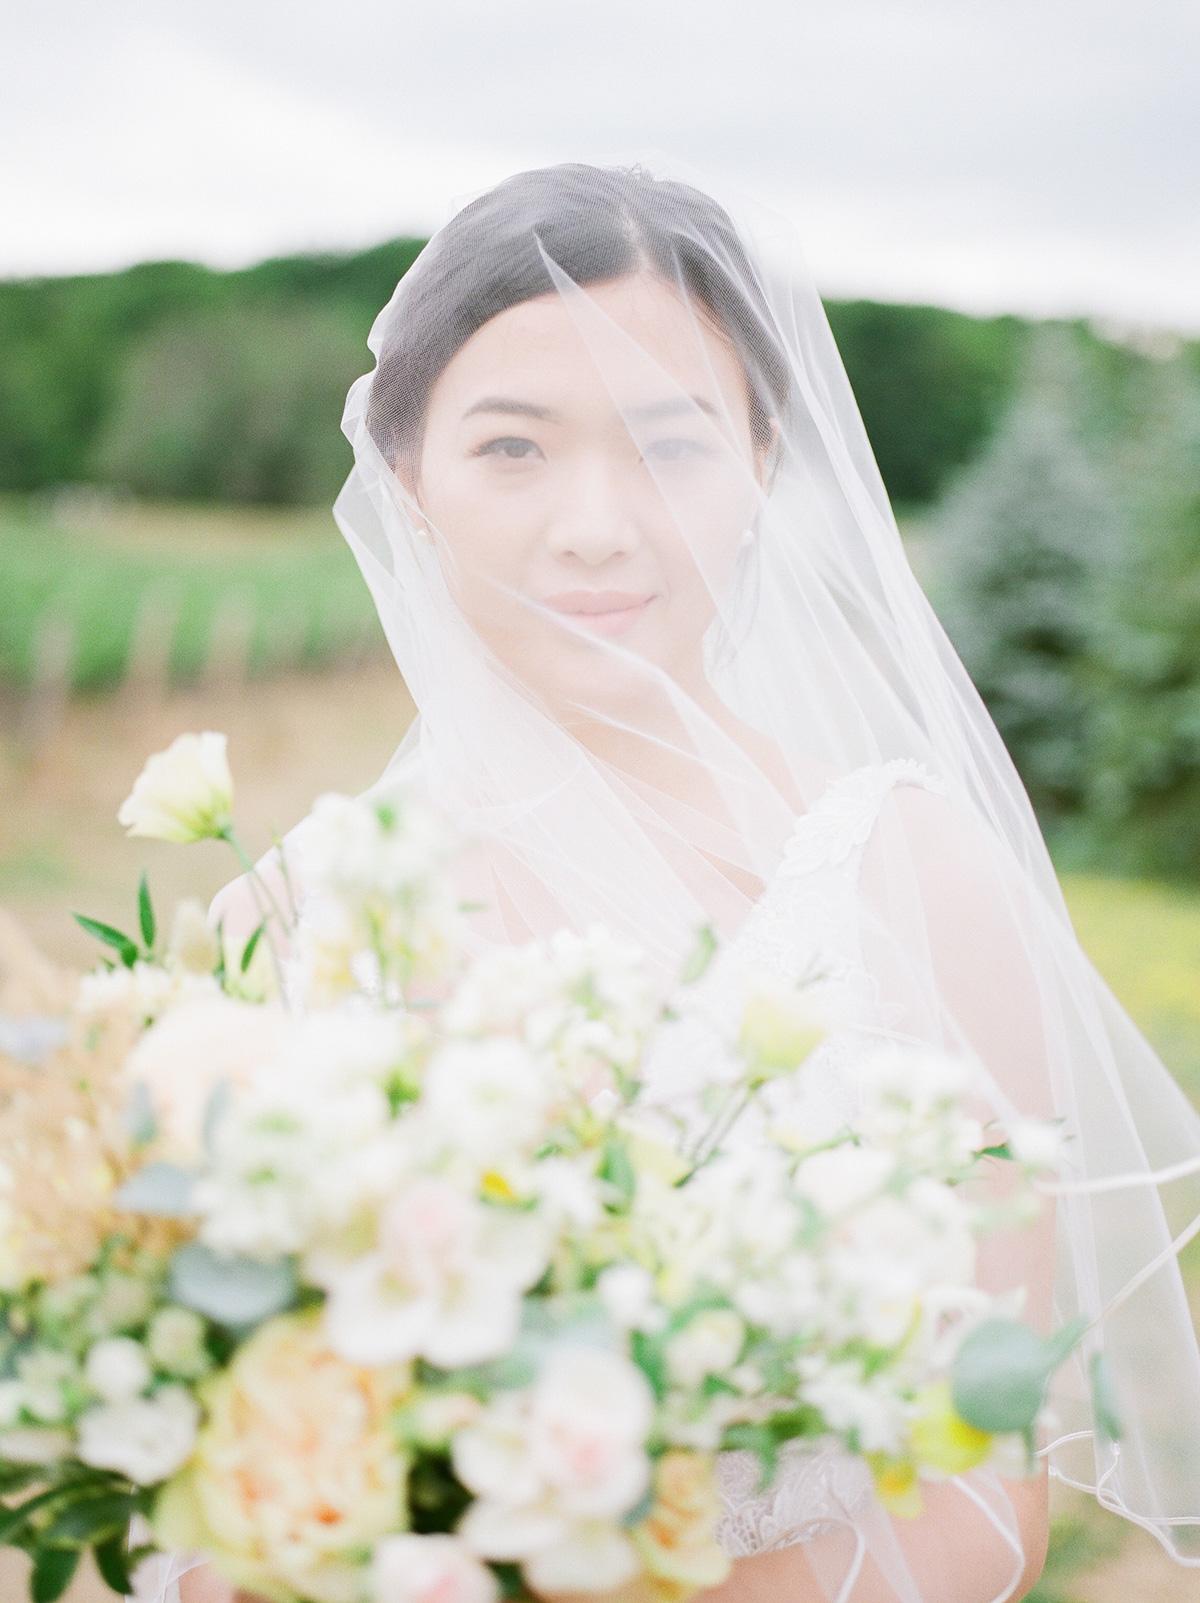 jennifer-xu-photography-vineyard-bride-swish-list-rosewod-eatstes-winery-beamsville-wedding-editorial-37.jpg